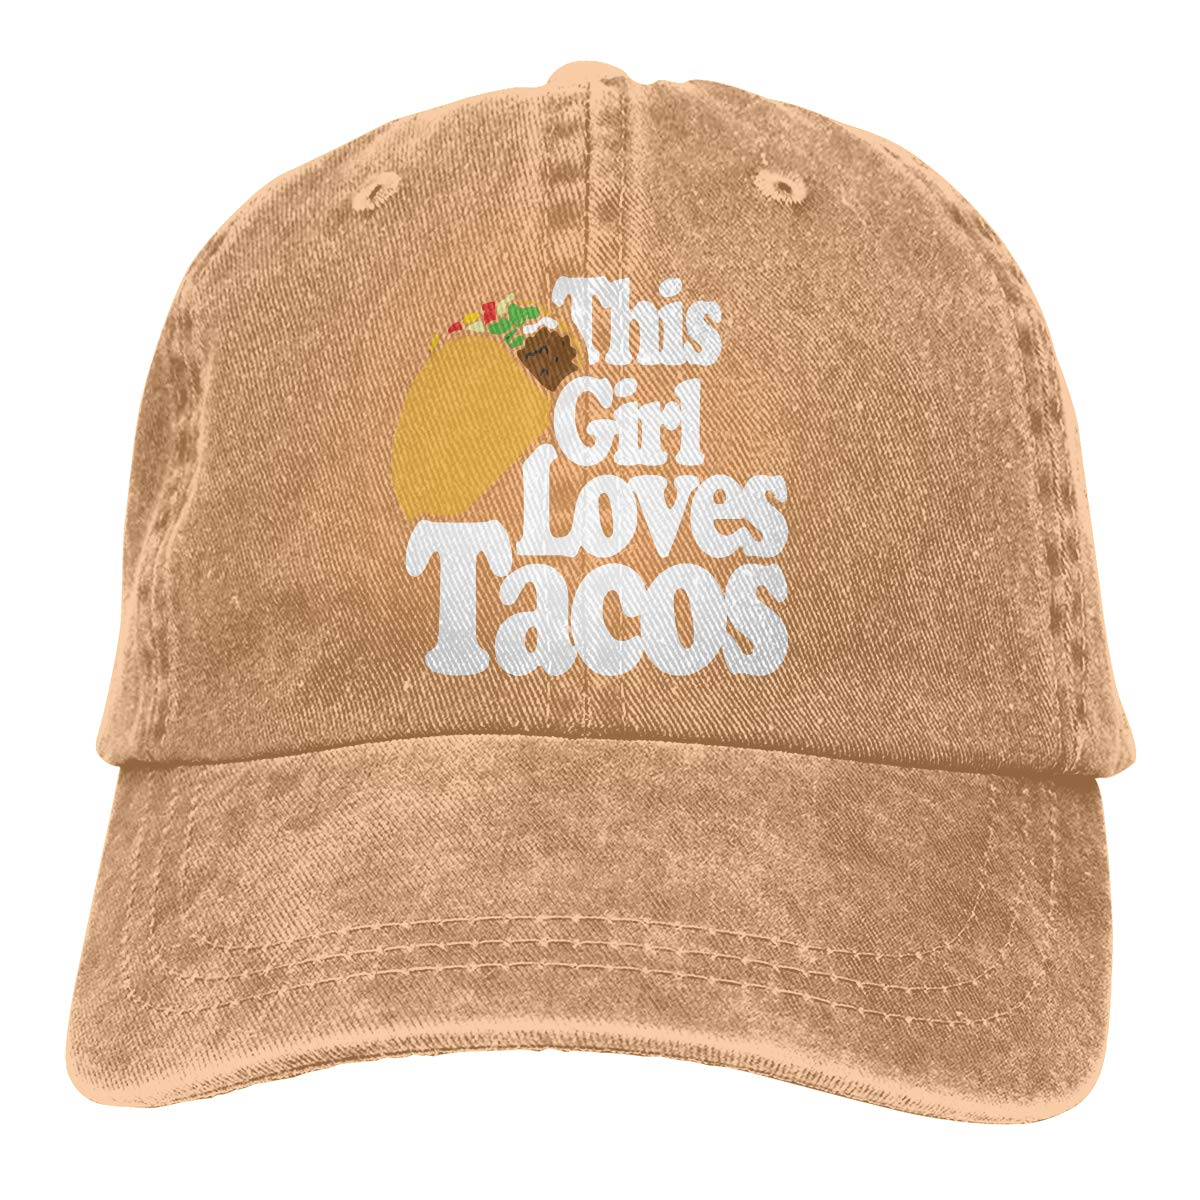 This Girl Loves Tacos Adult Custom Jeans Hip Hop Cap Adjustable Baseball Cap